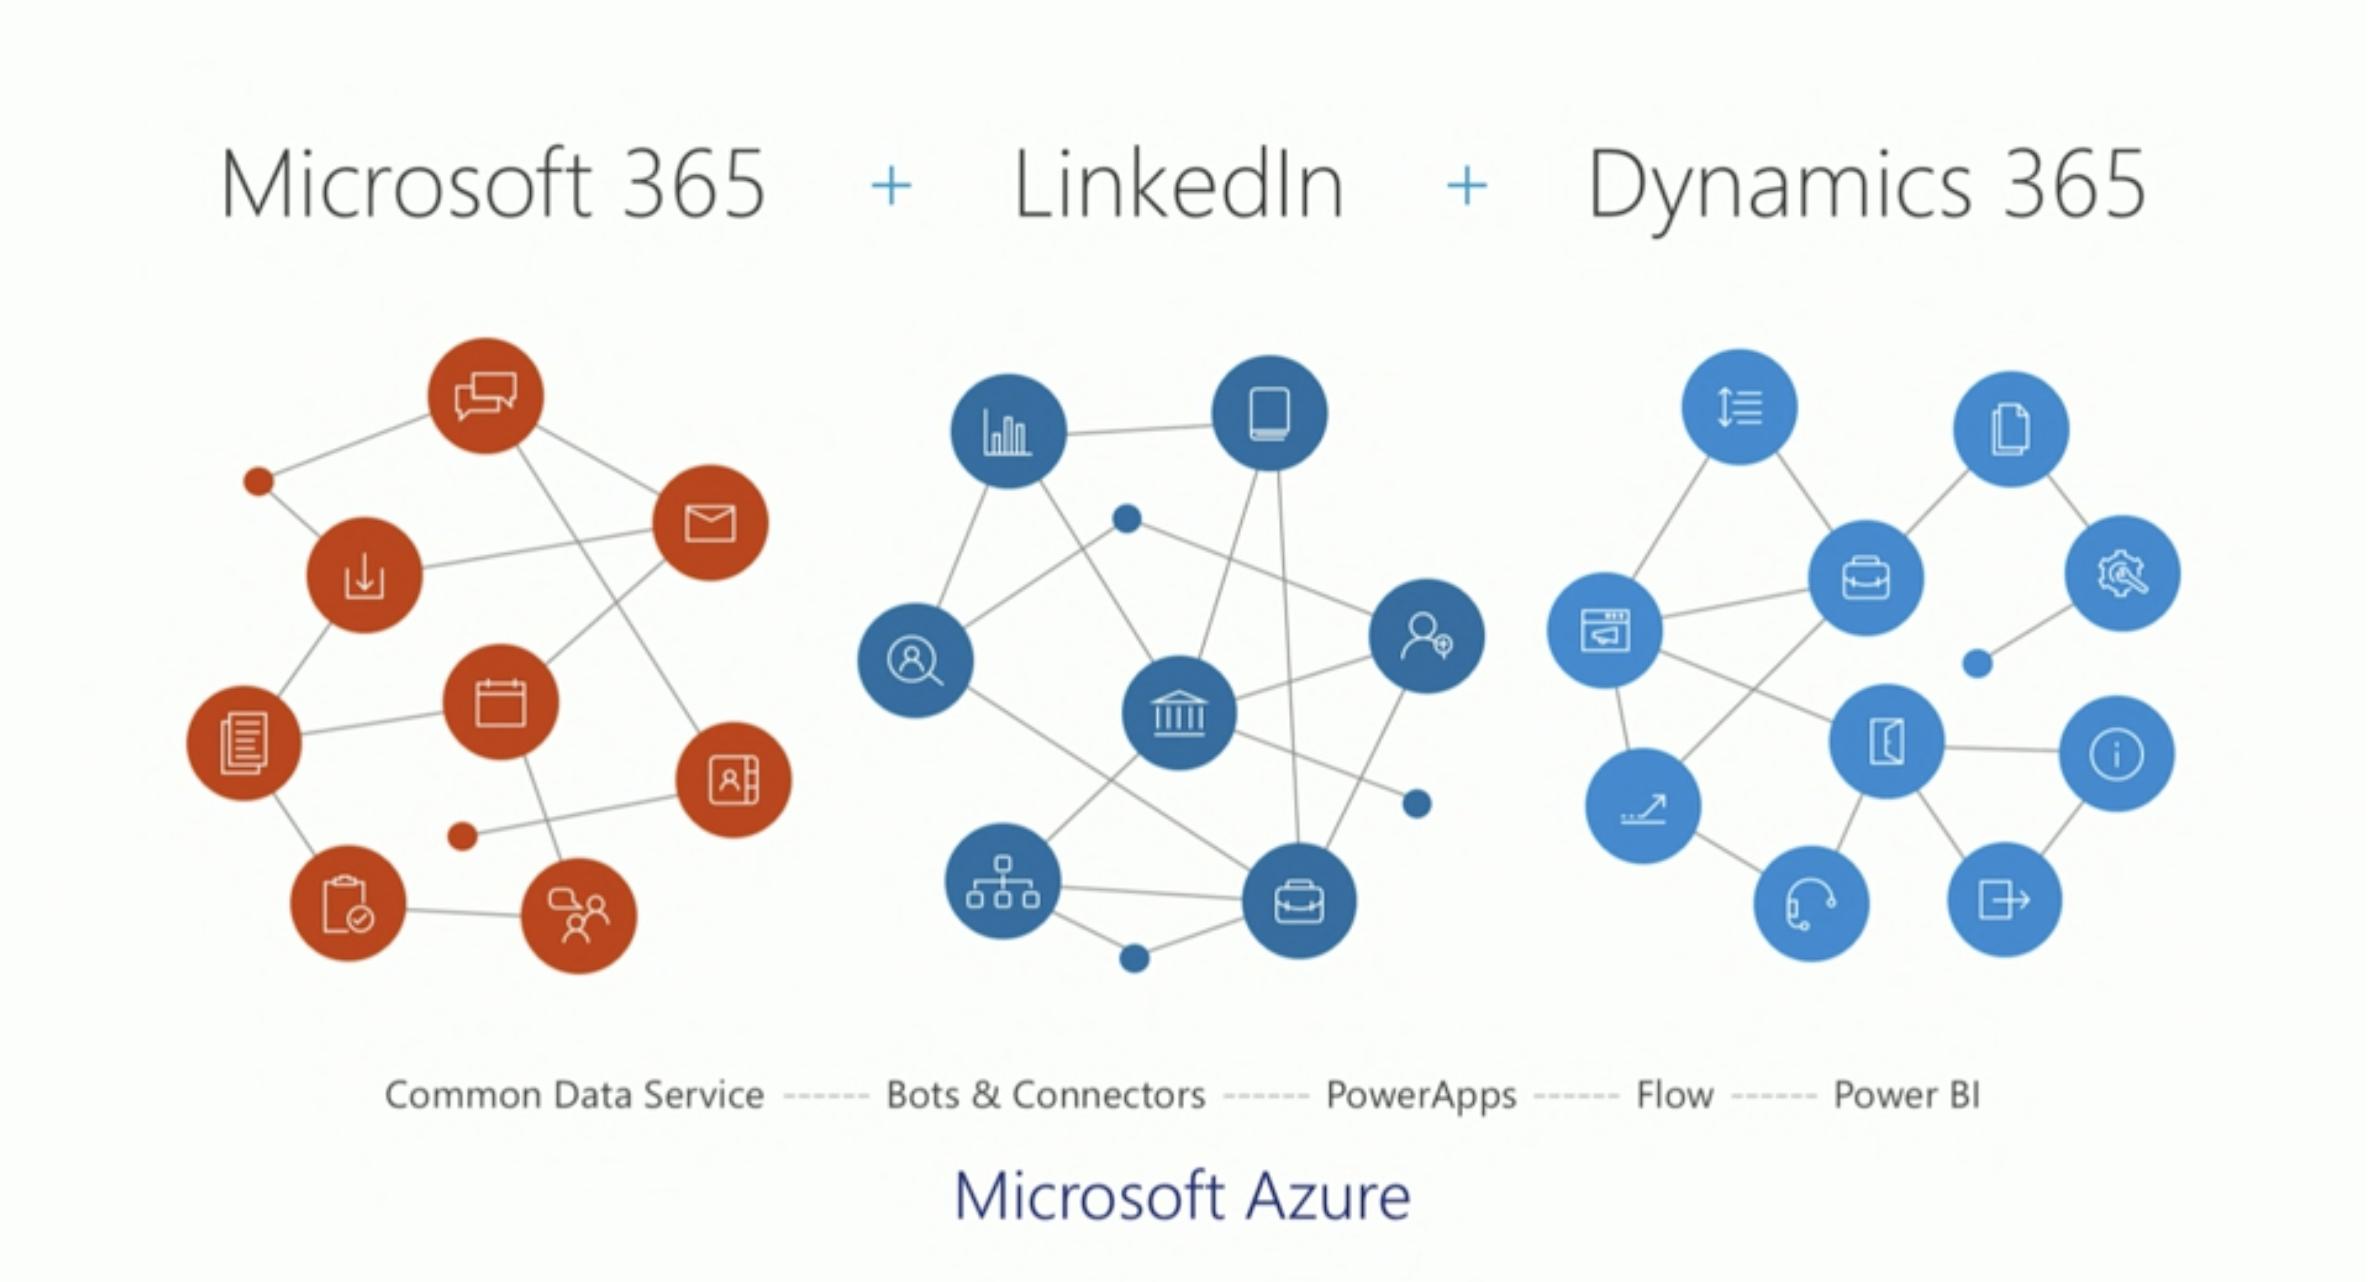 Microsoft ignite 2017 integrazione Microsoft 365, LinkedIn e Dynamics 365